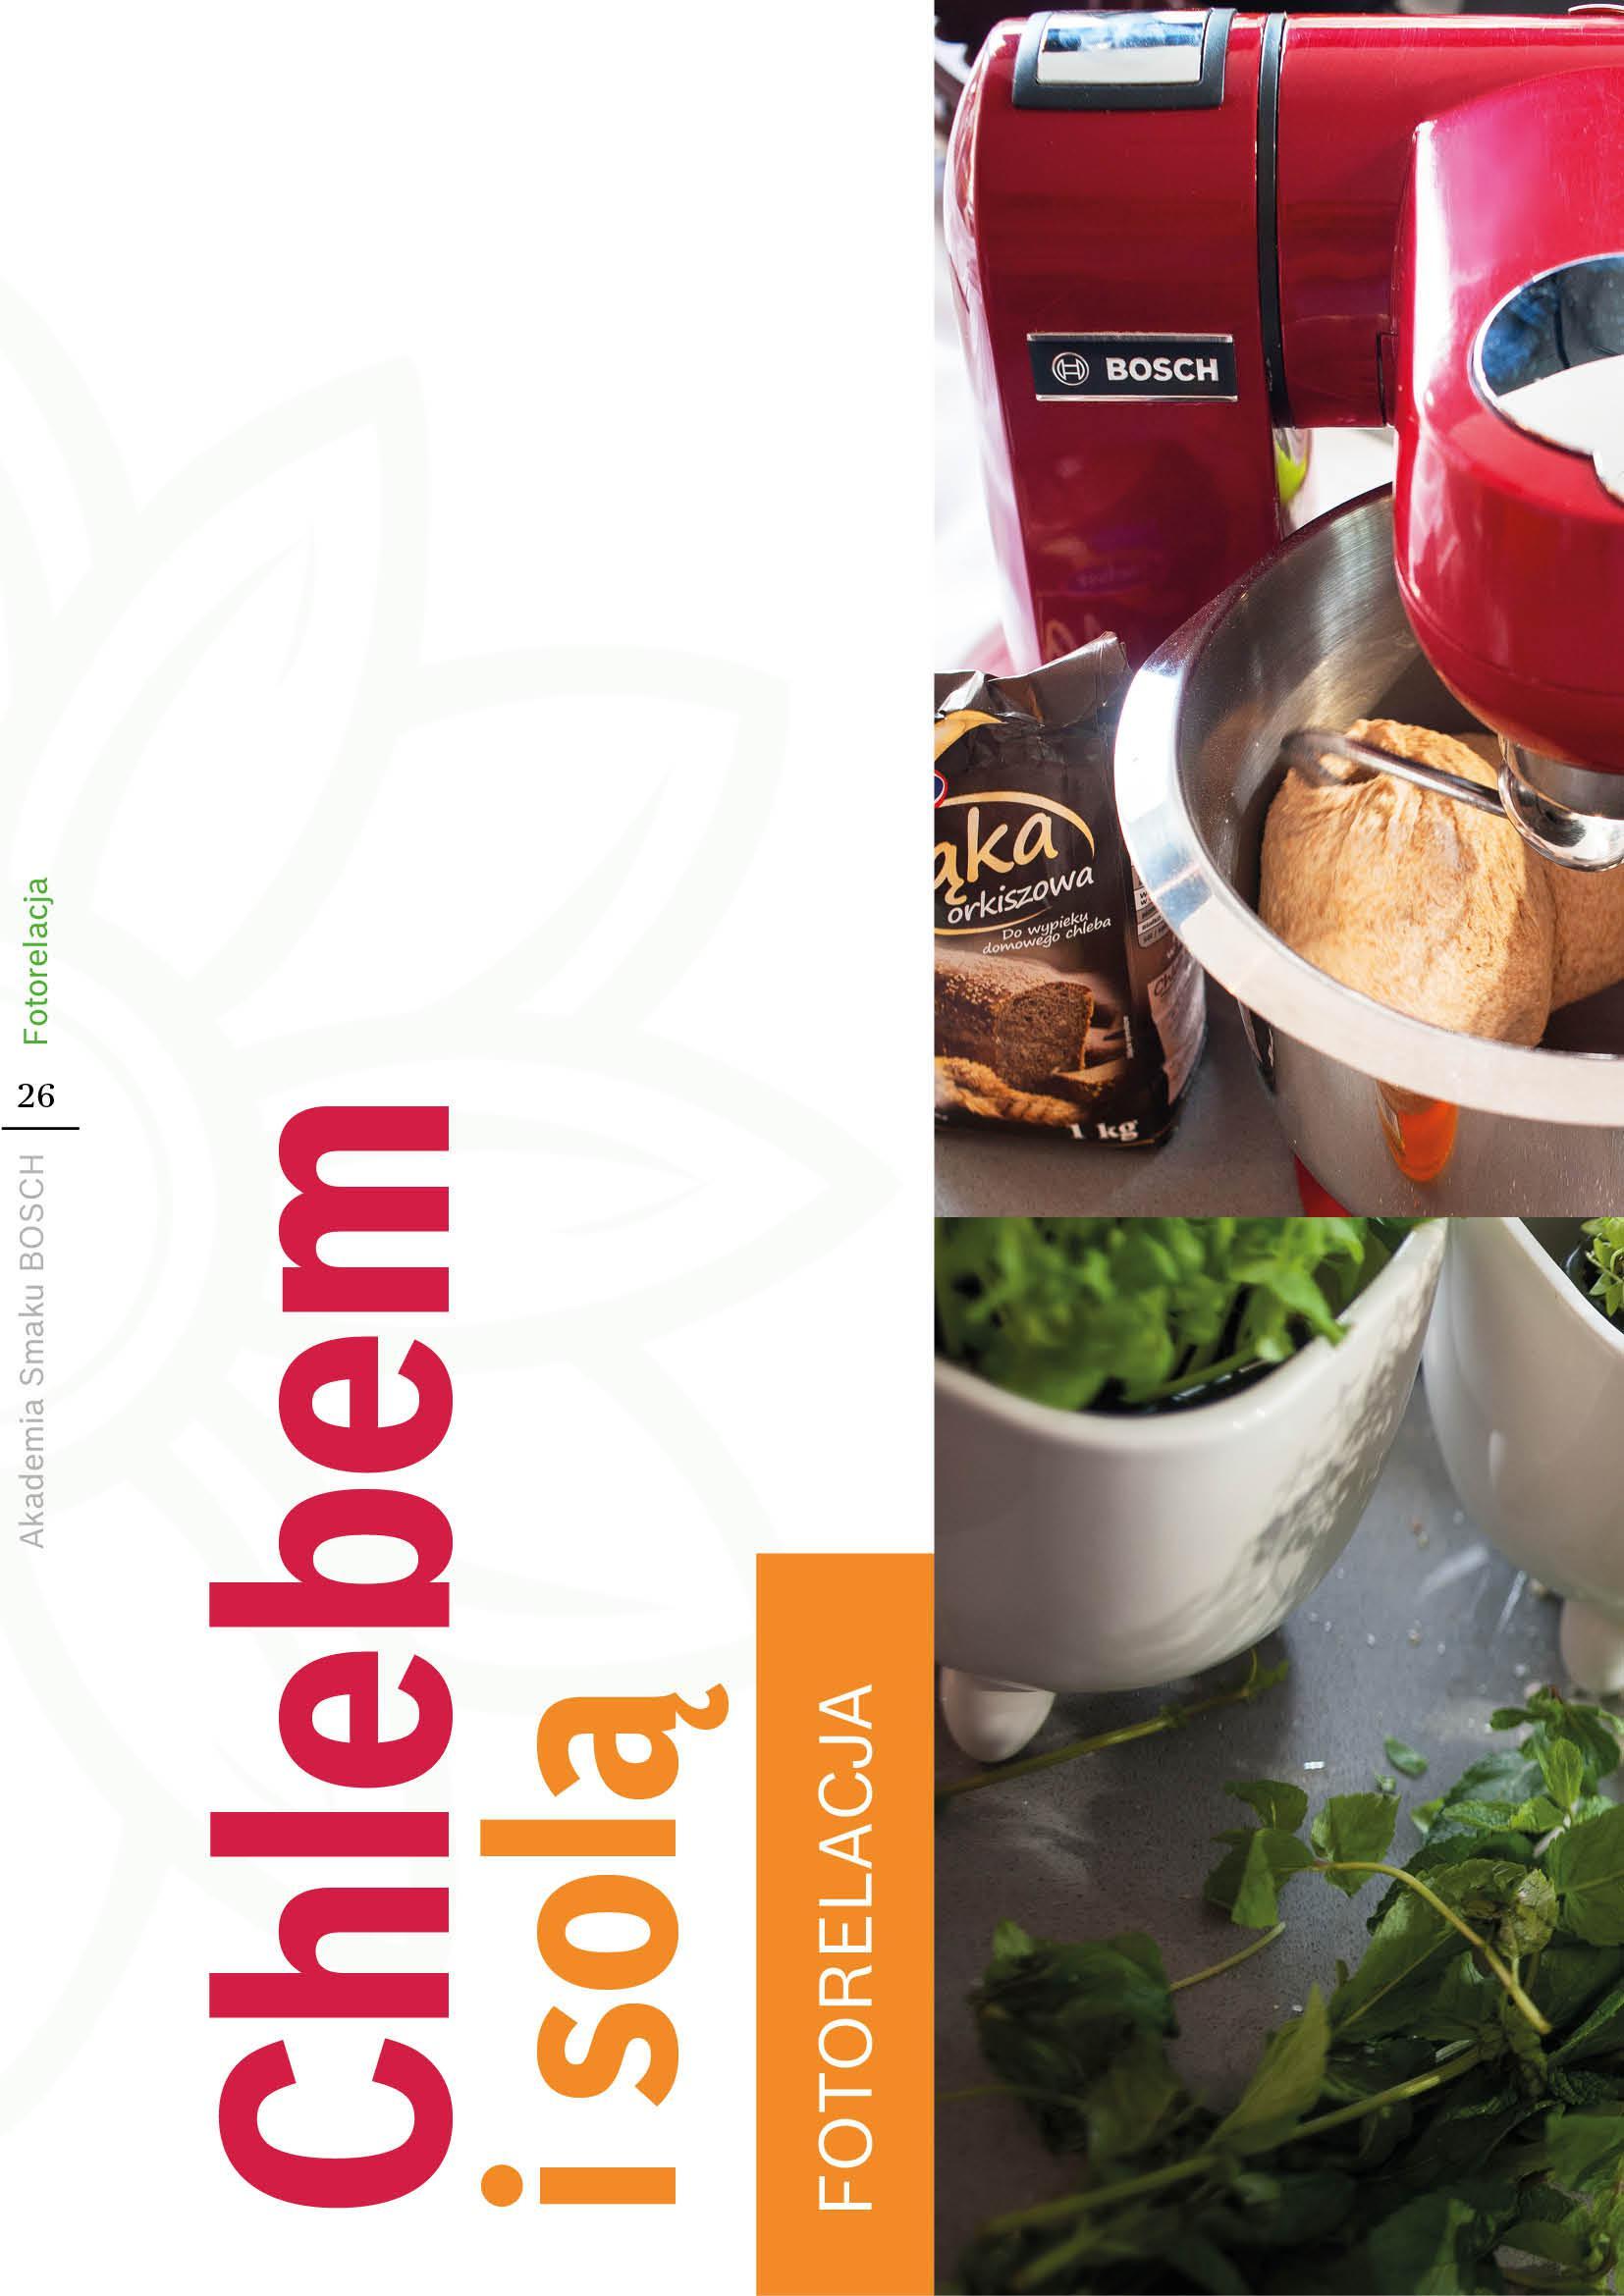 Chlebem i solą - Strona 26